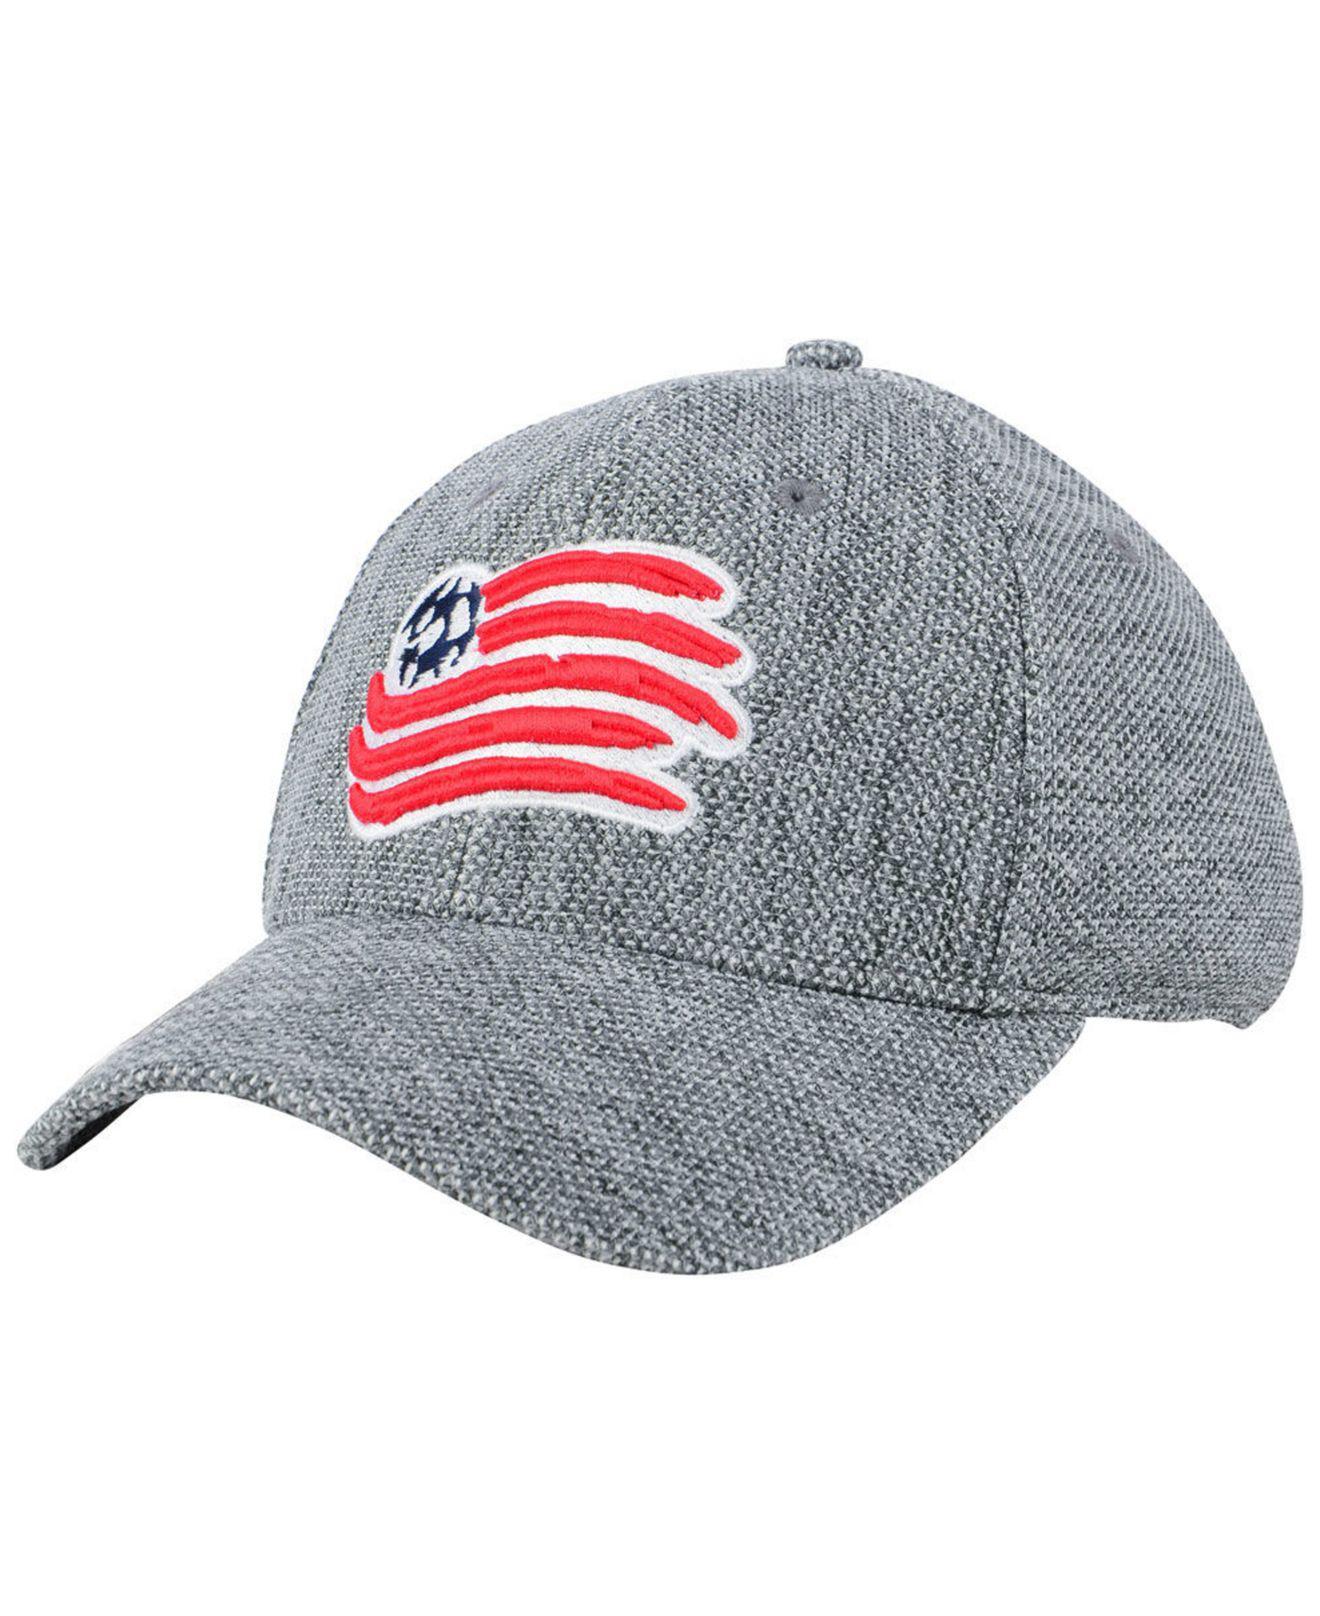 Lyst - Adidas New England Revolution Penalty Kick Flex Cap in Gray ... b3bc466f817